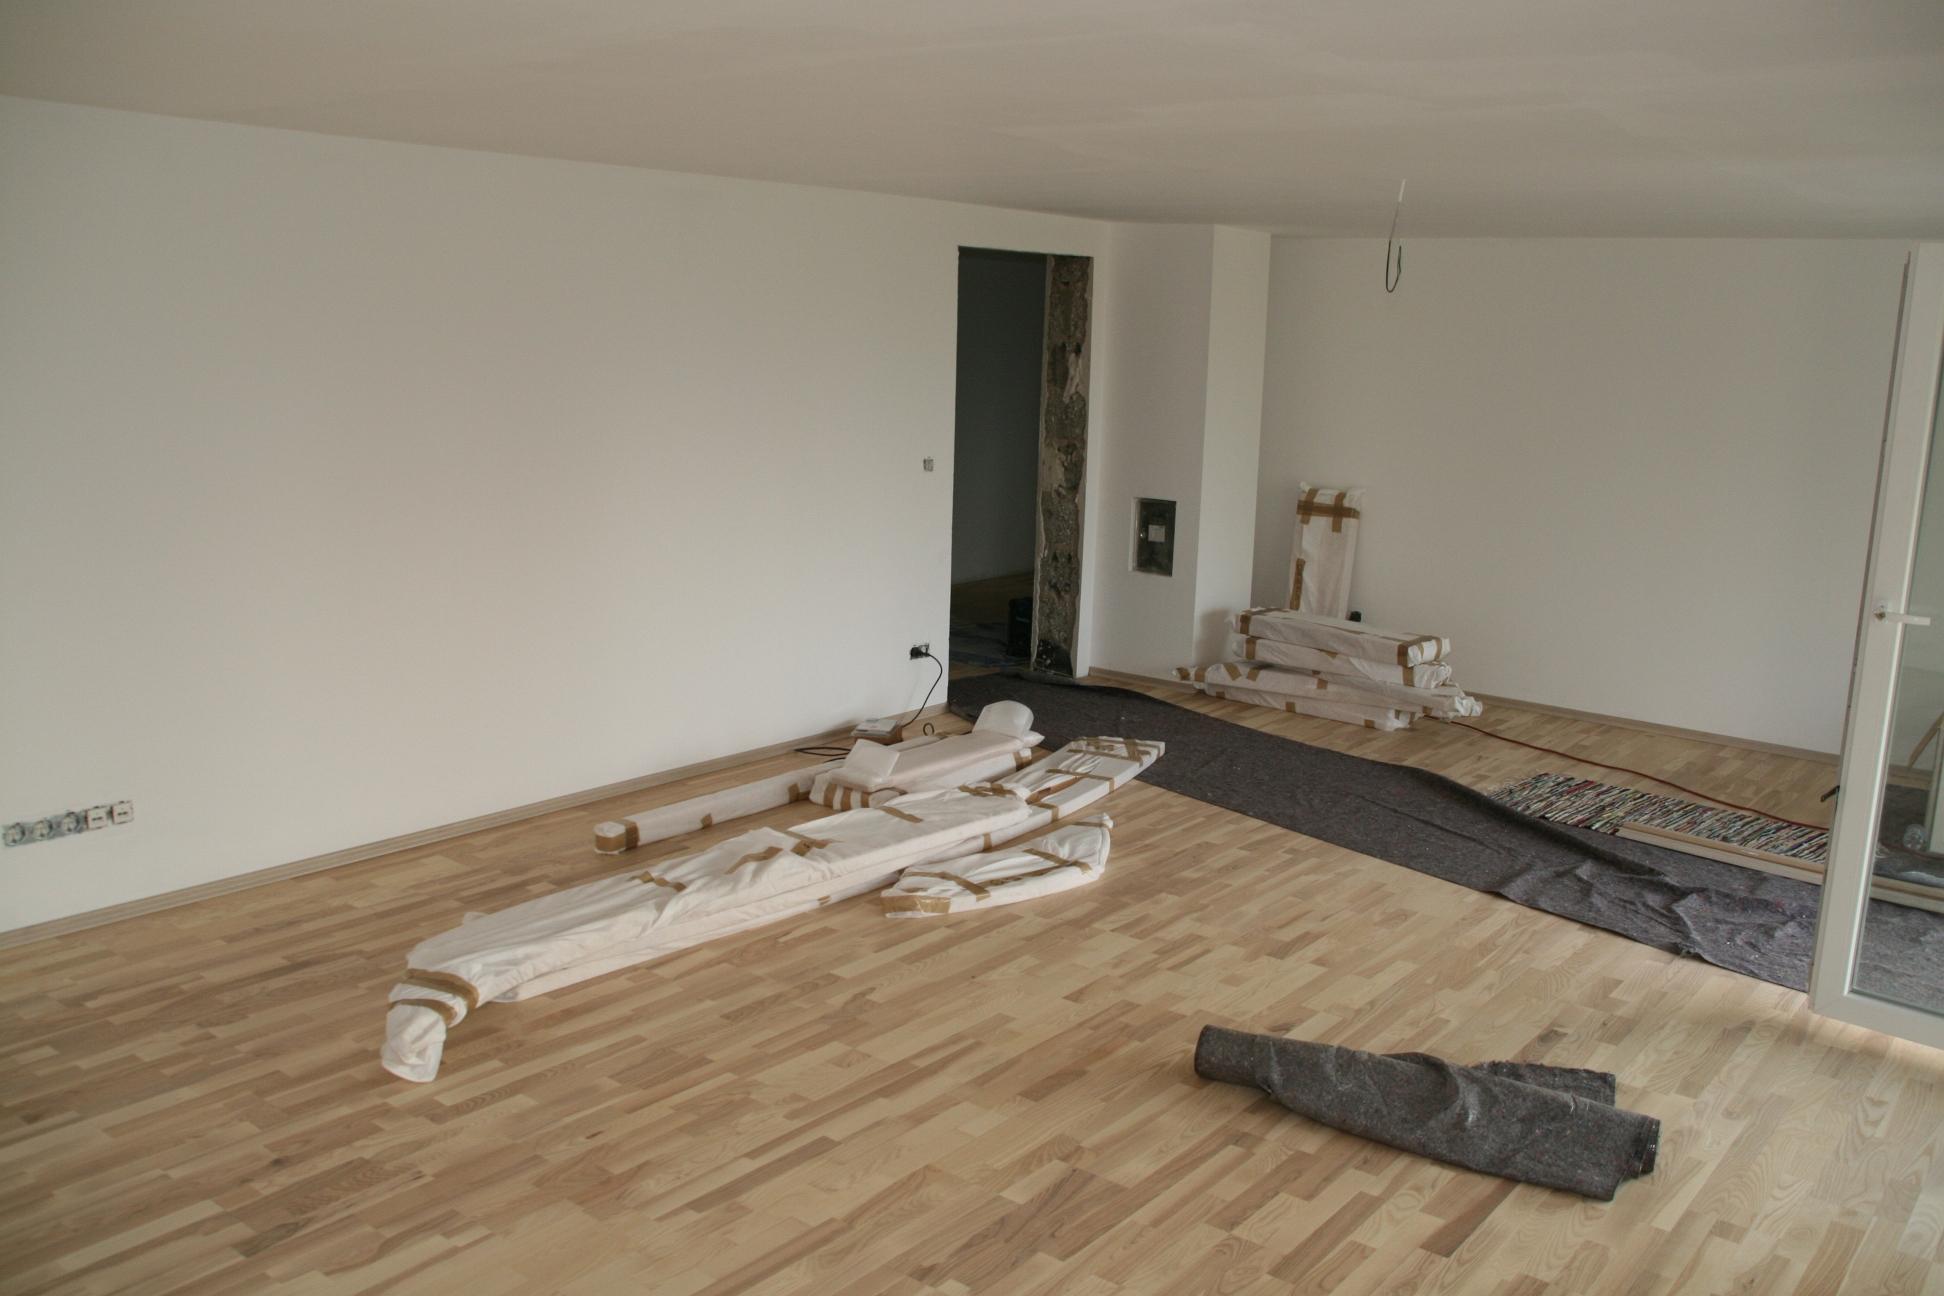 vera christophs baublog tripp trapp die trepp ist da. Black Bedroom Furniture Sets. Home Design Ideas